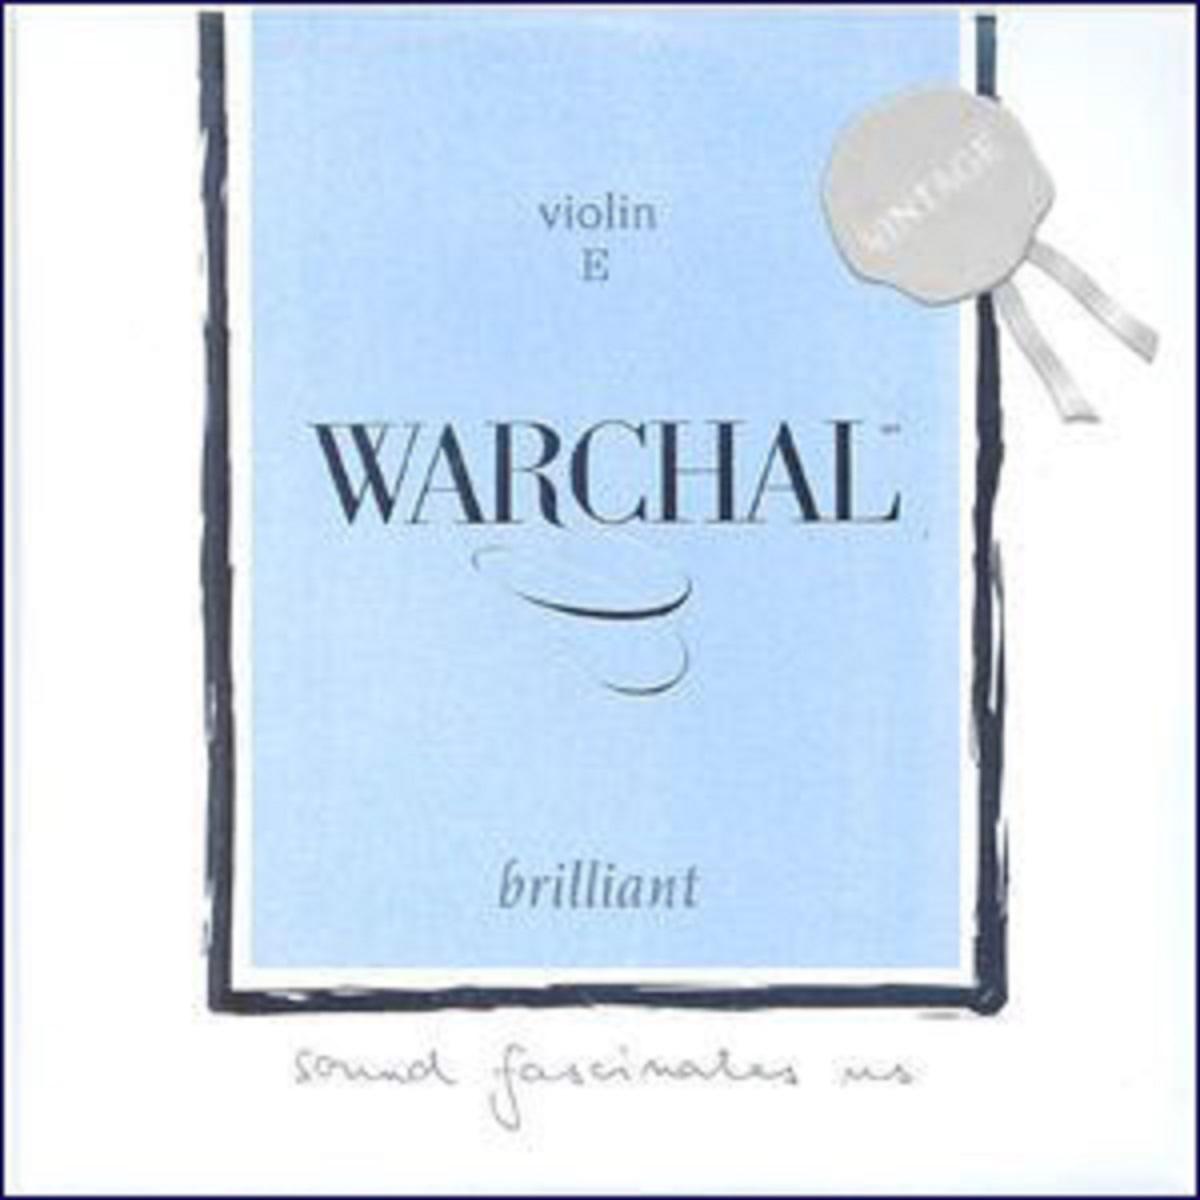 цена Струна E для скрипки Warchal Brilliant Vintage 801B онлайн в 2017 году